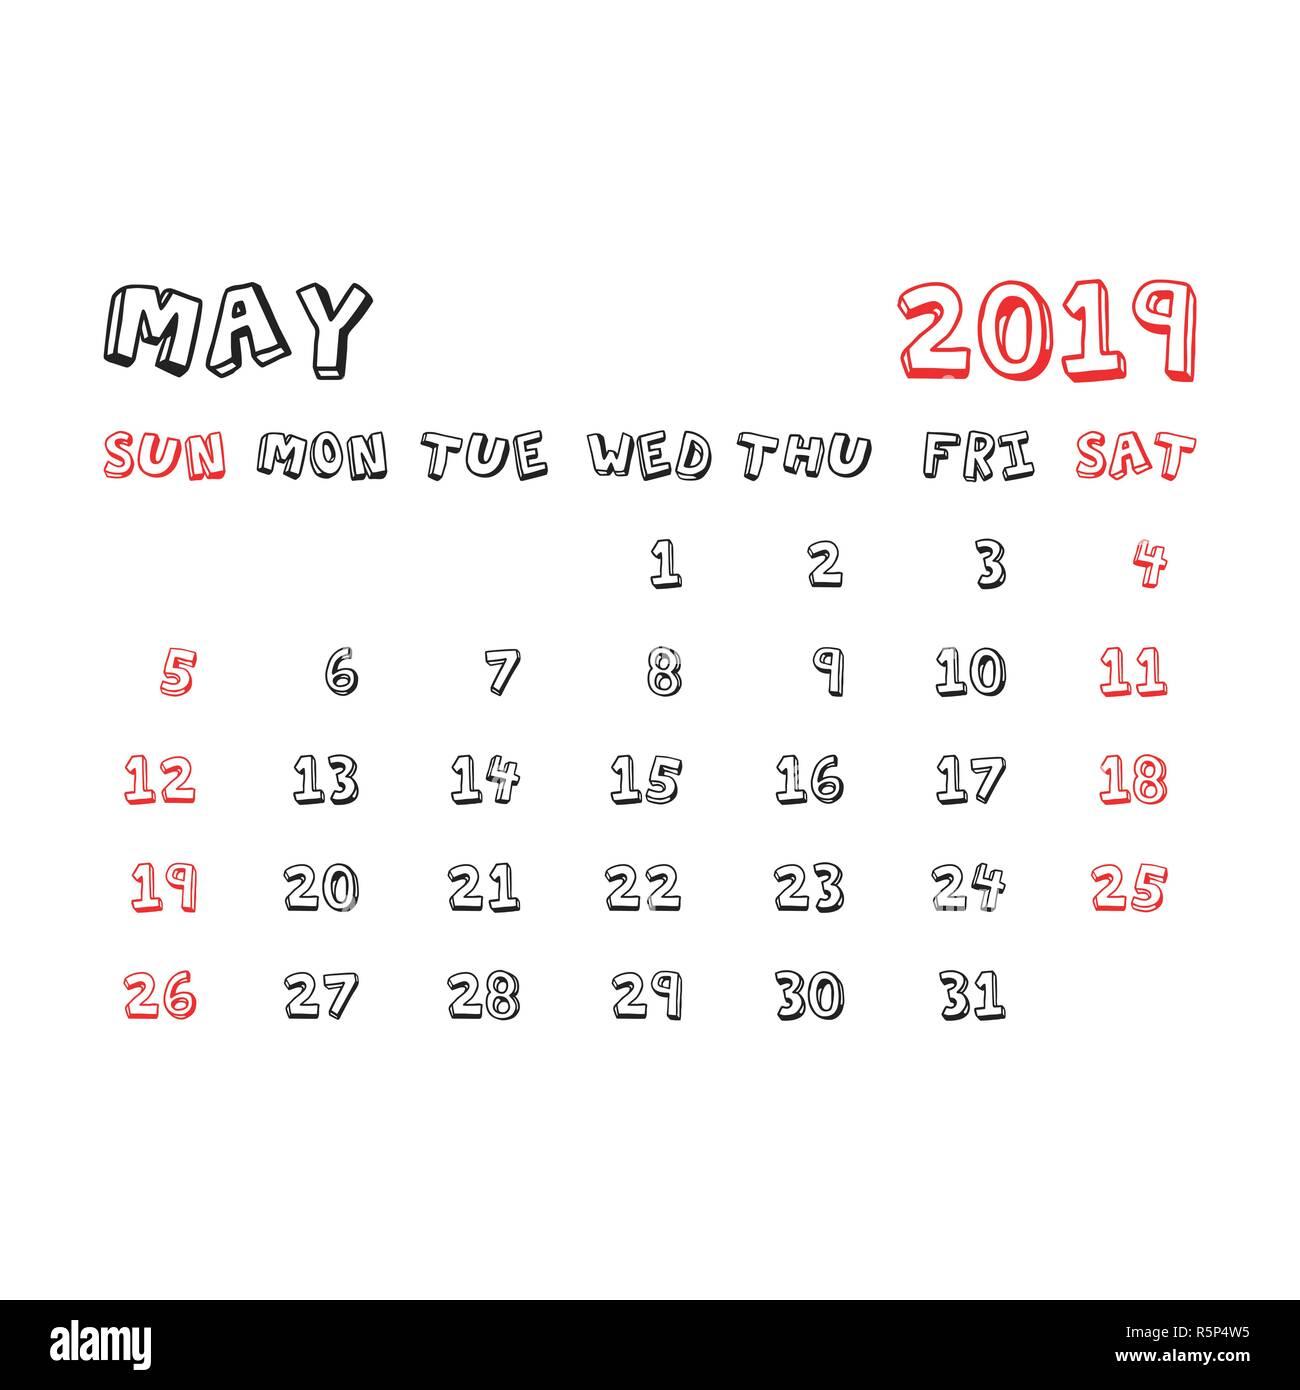 Calendario Dibujo 2019.Calendario Mayo 2019 Ano En Estilo Infantil De Dibujos